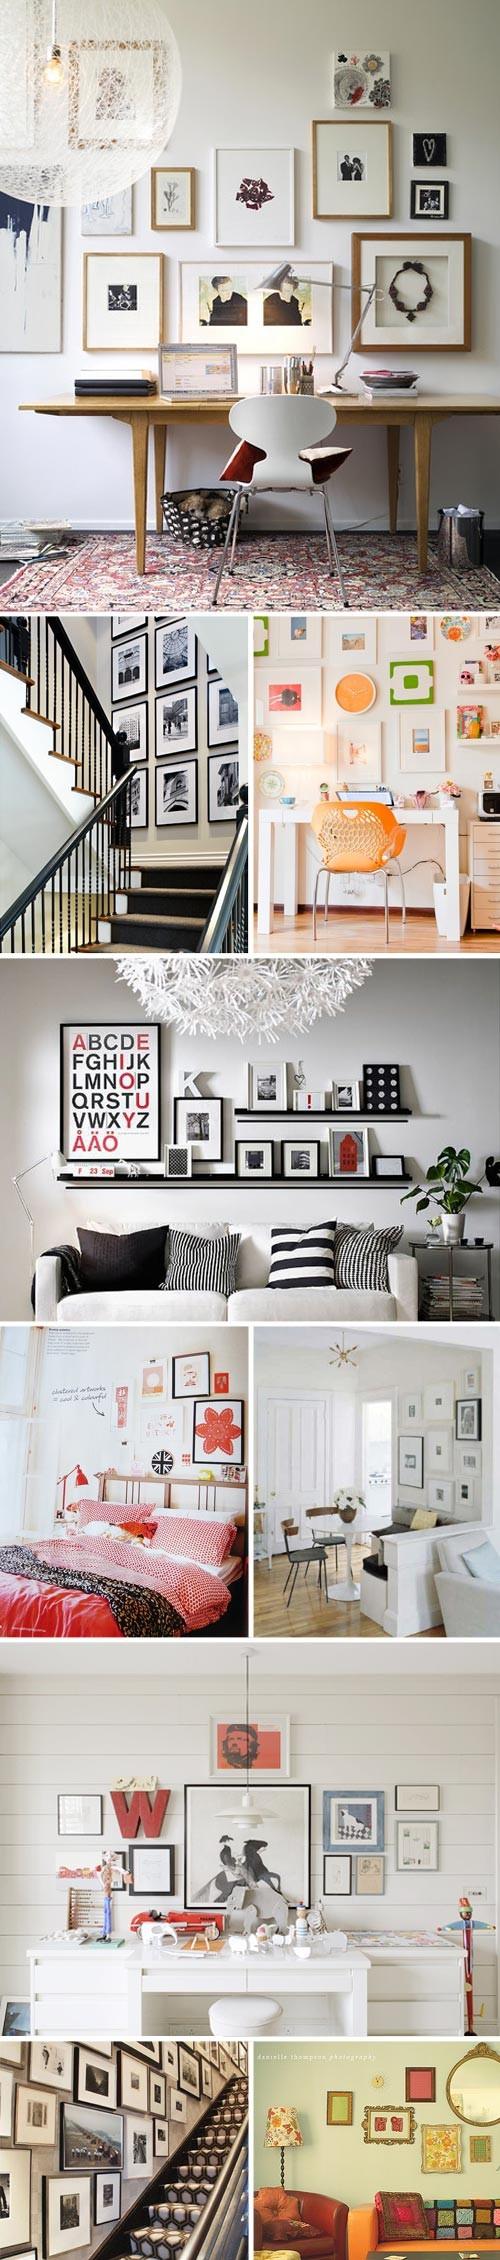 Wall decor wall inspirations pinterest wall decor walls and